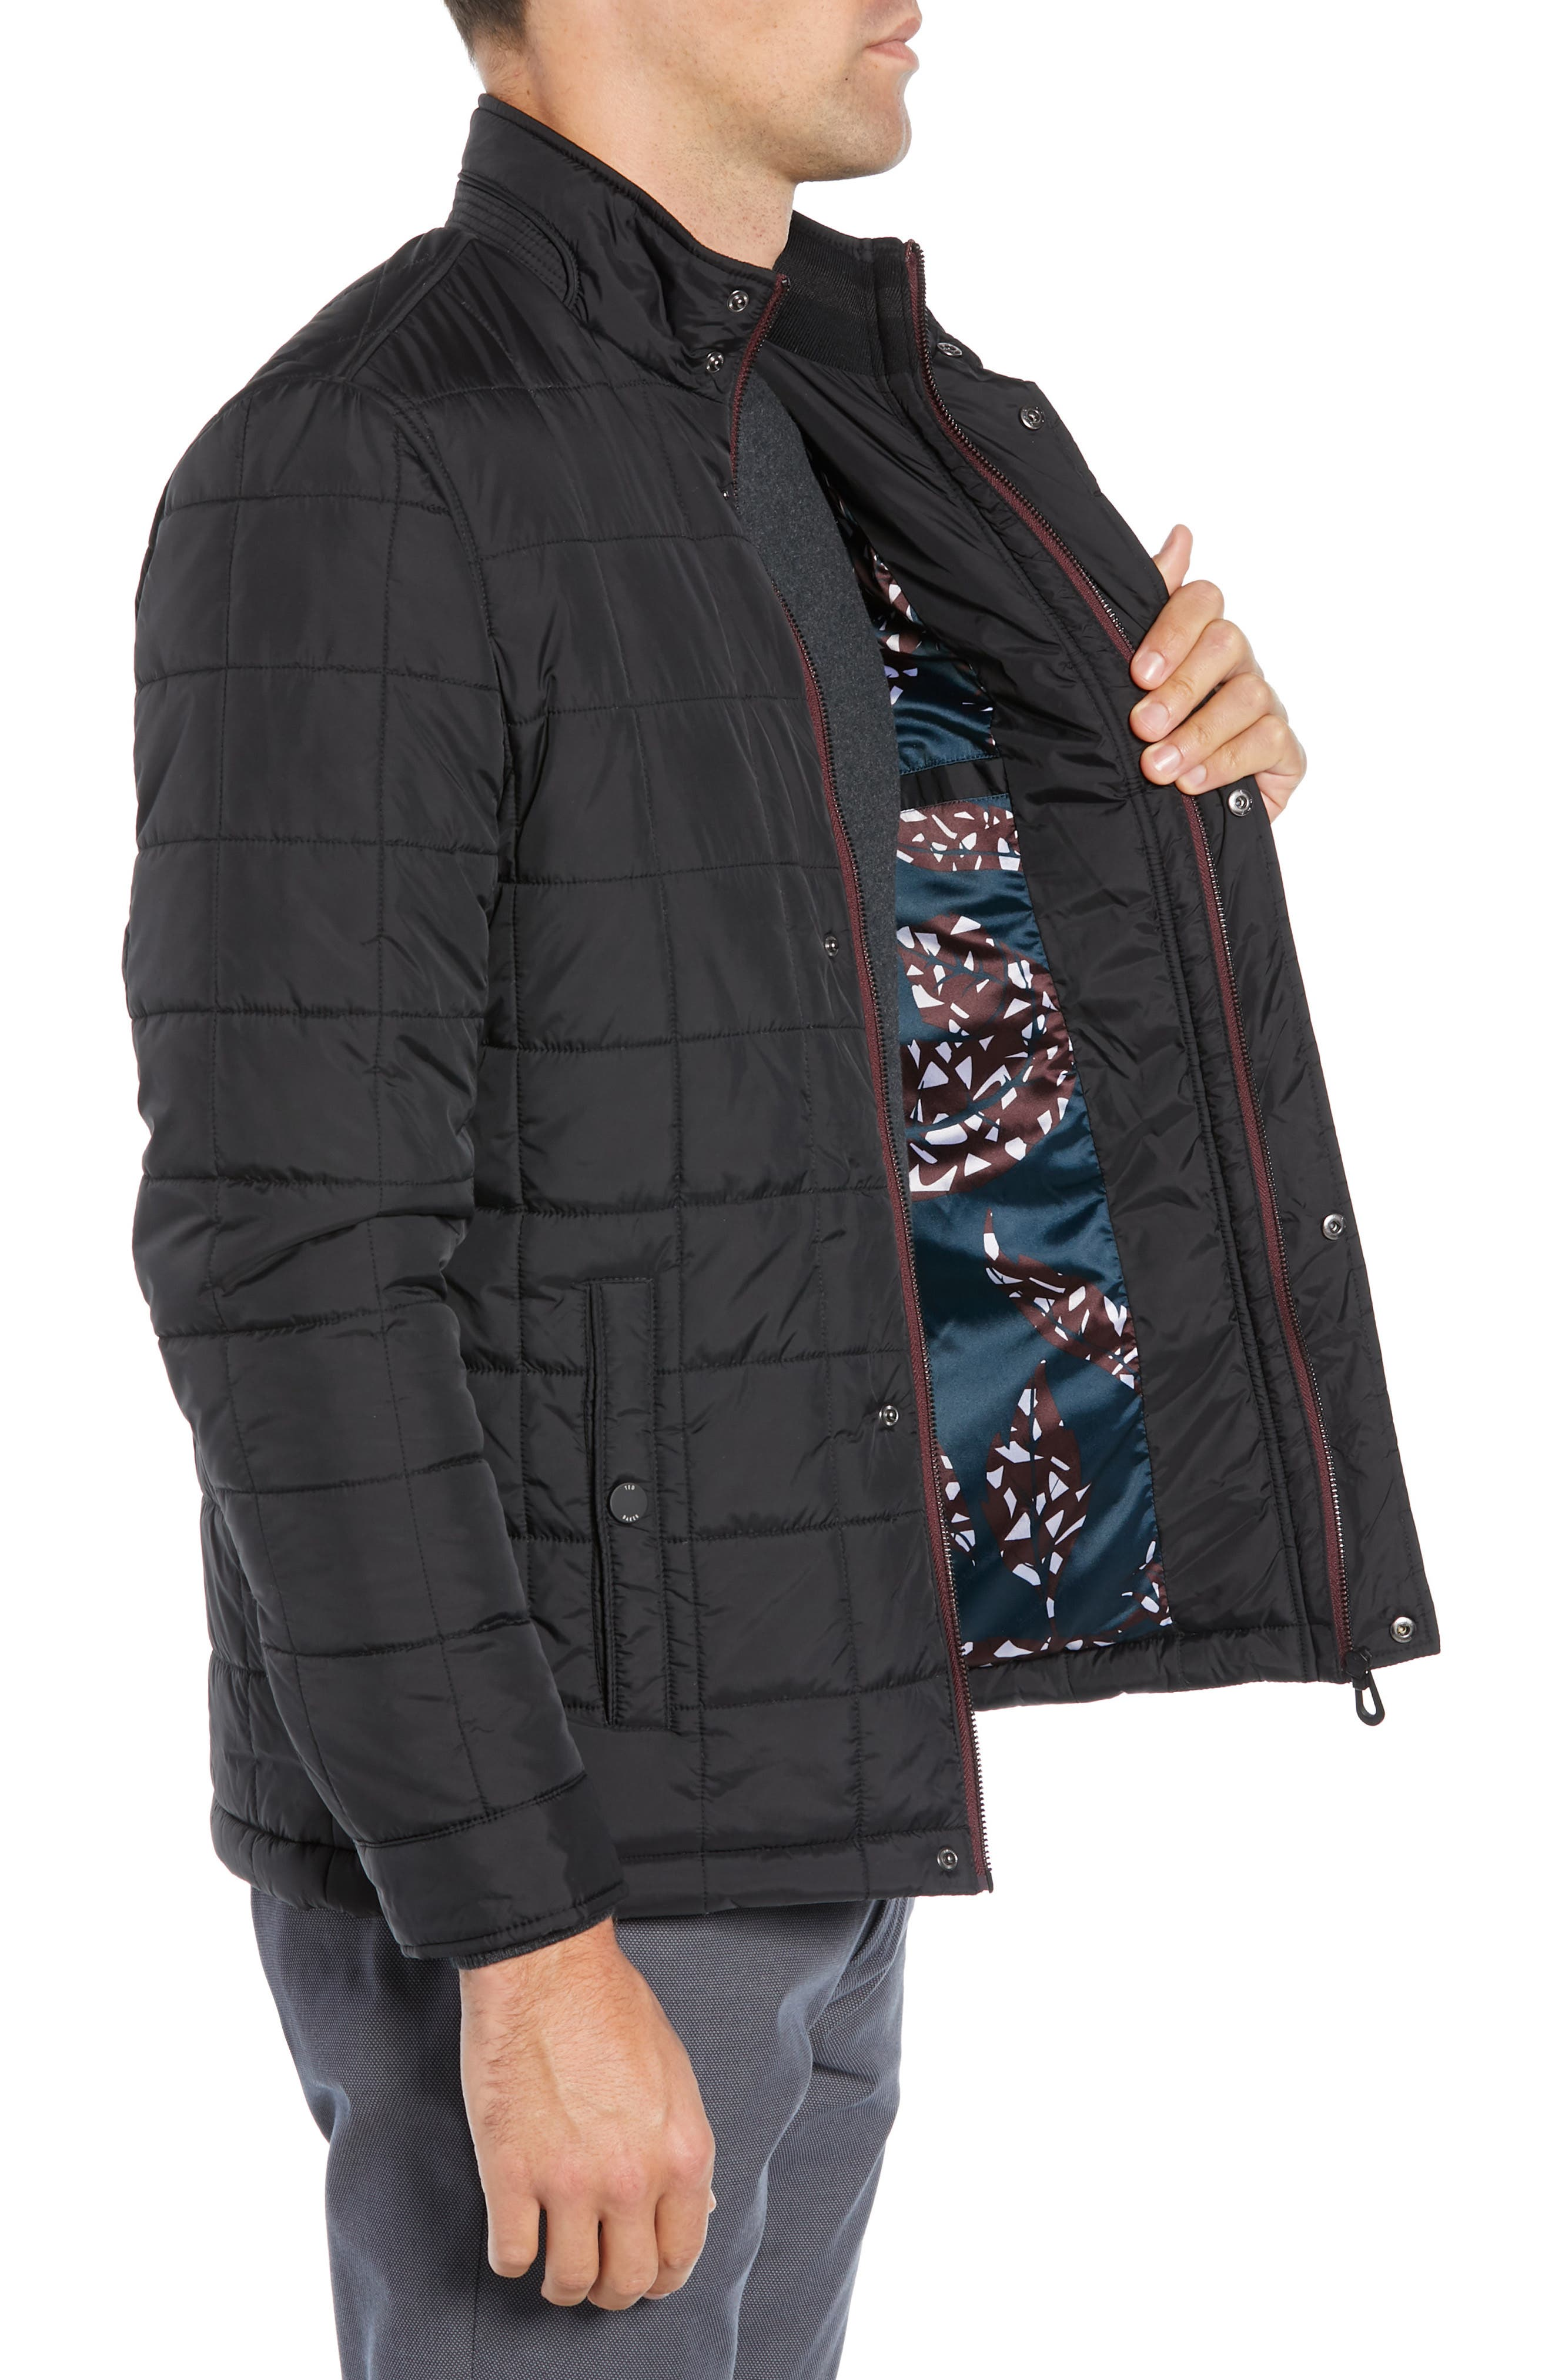 Lesta Quilted Slim Fit Jacket,                             Alternate thumbnail 3, color,                             BLACK